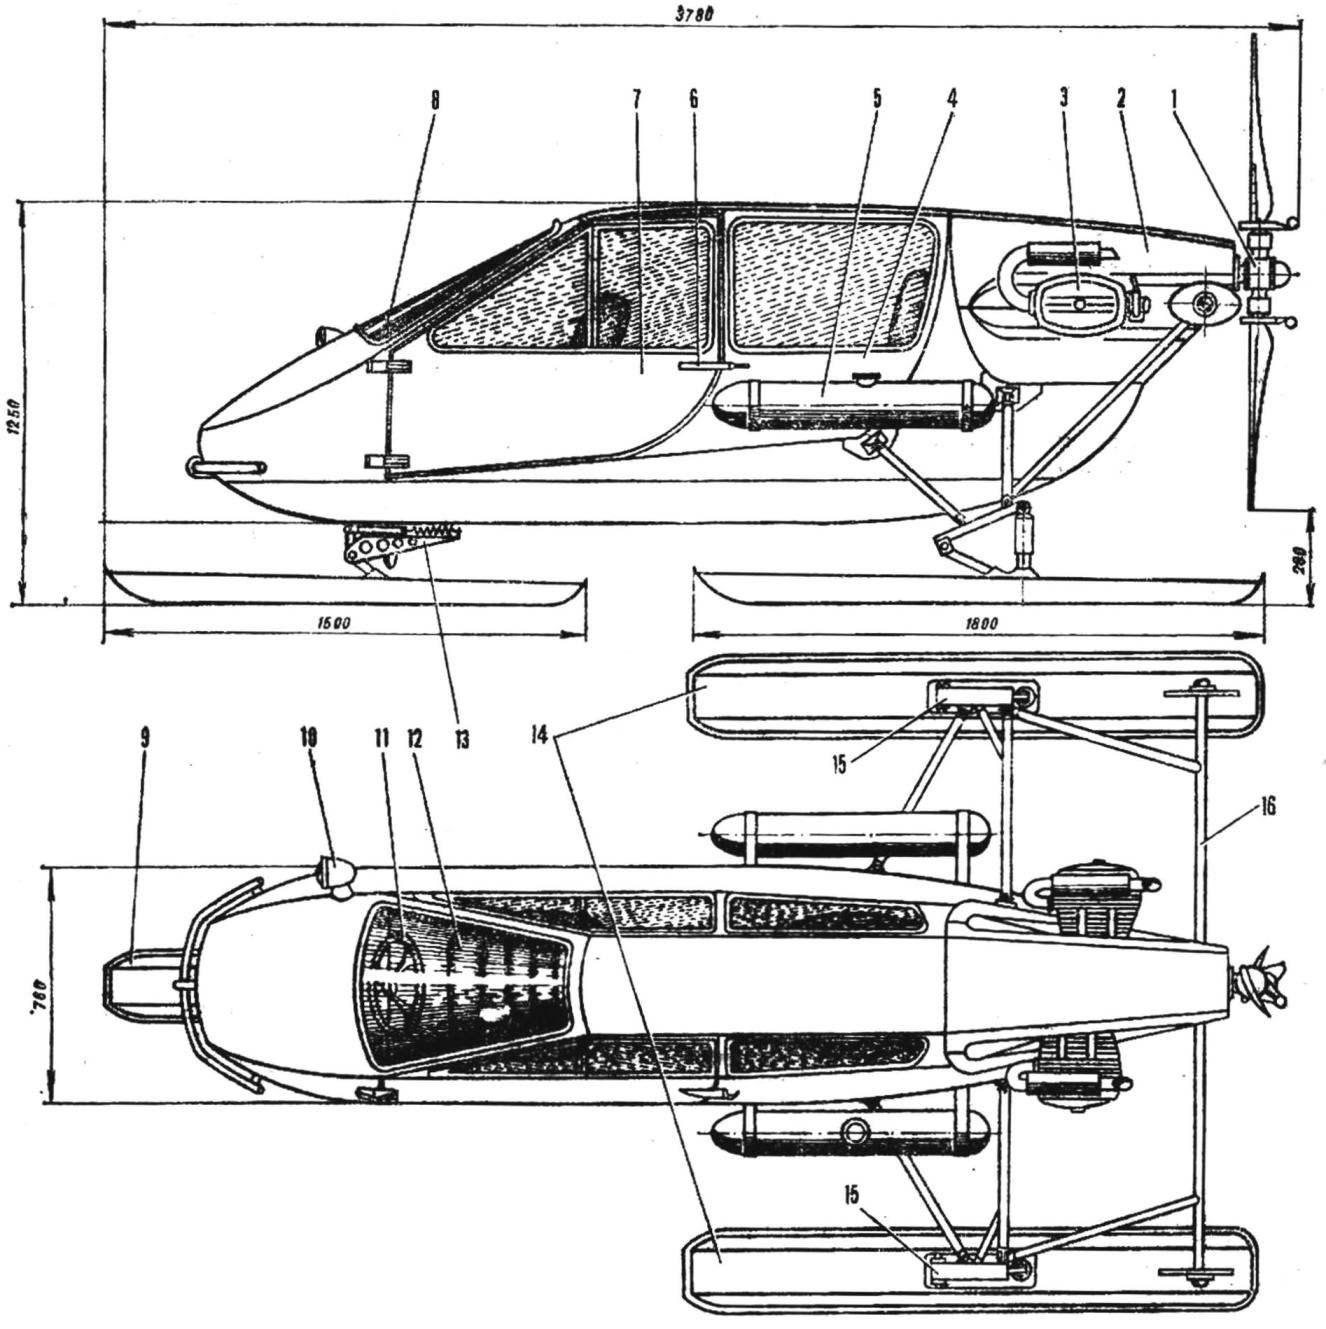 Рис. 1. Общий вид аэросаней